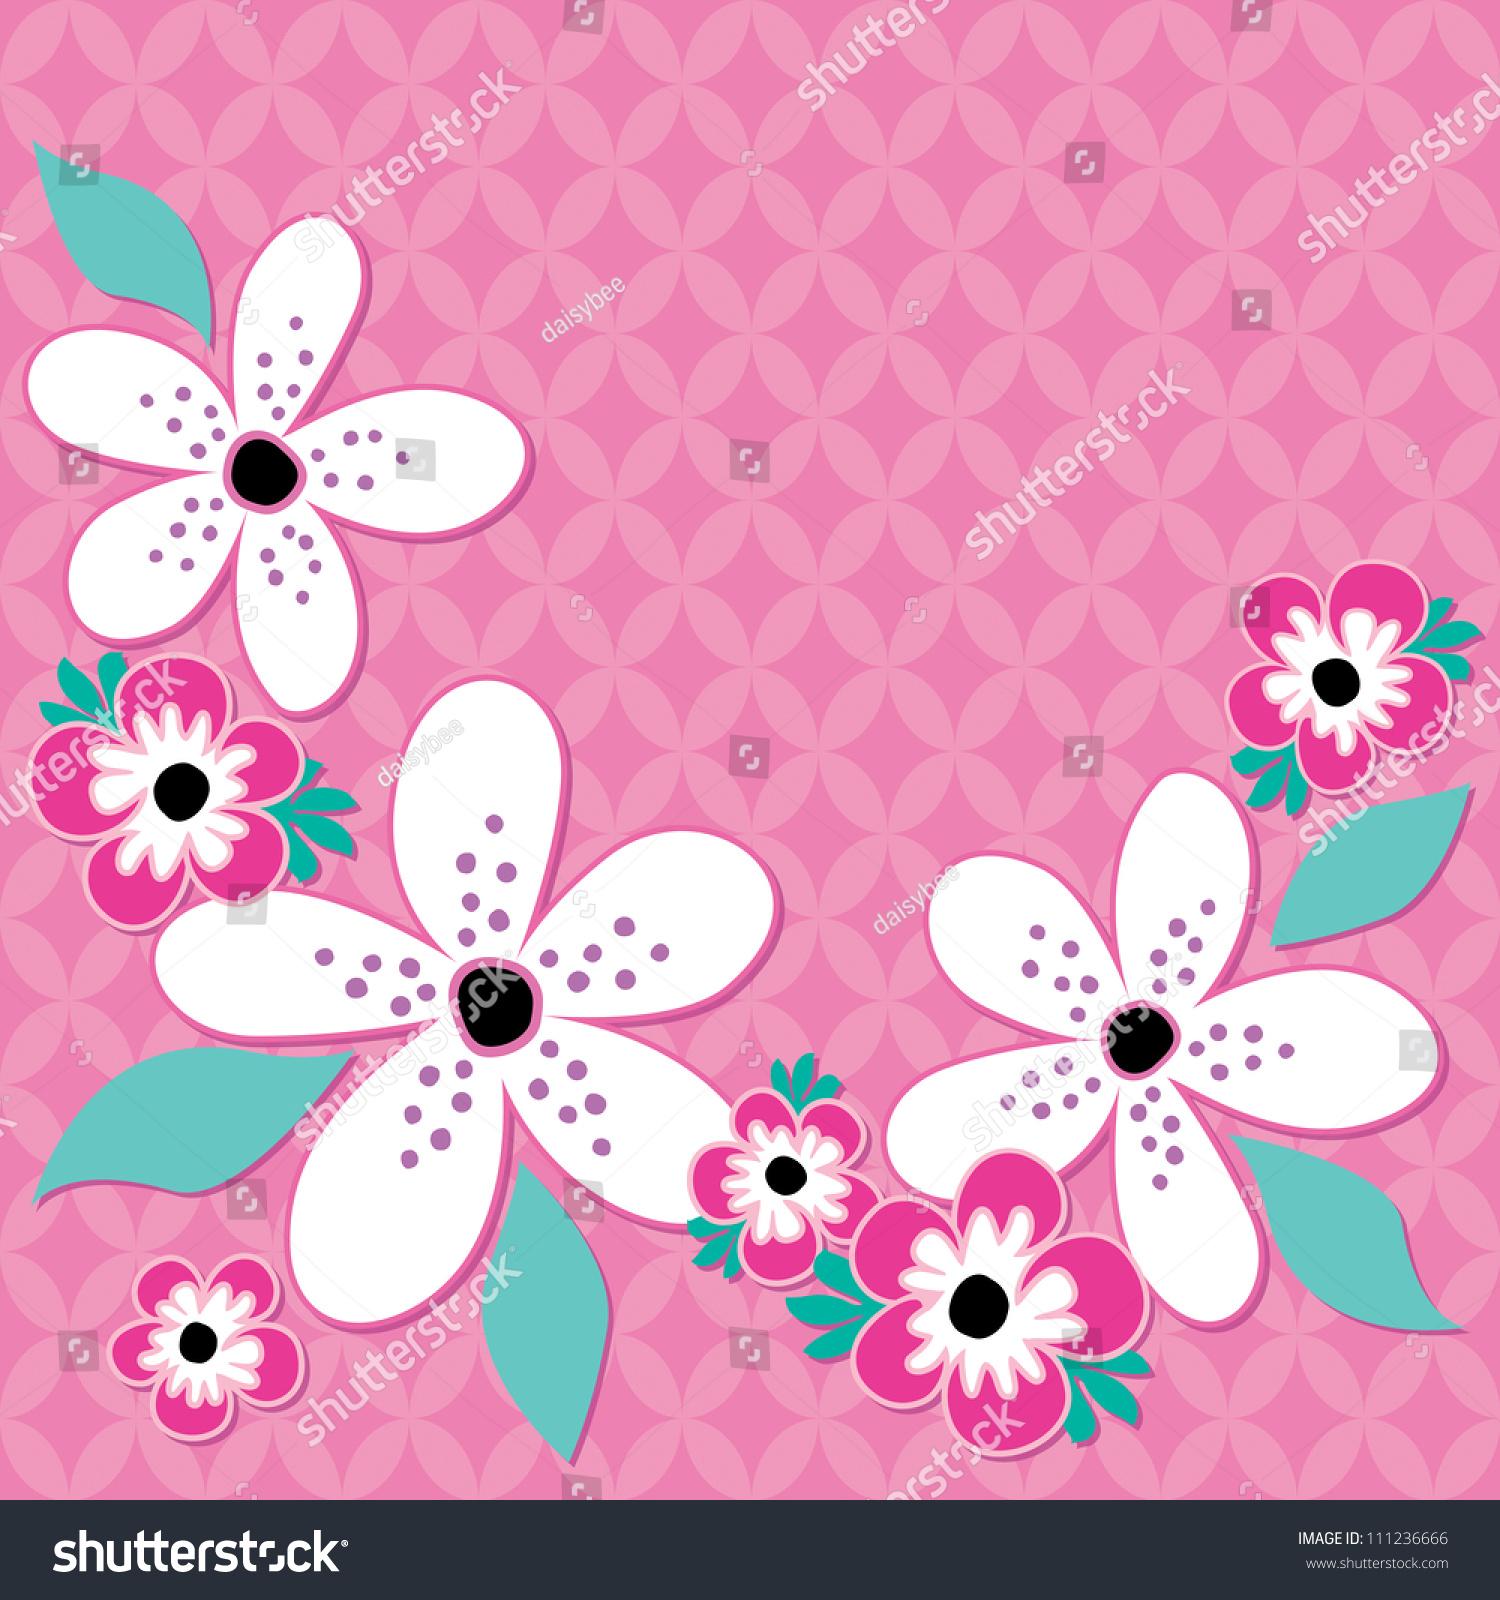 Raster Greeting Card Template Pink White Stock Illustration